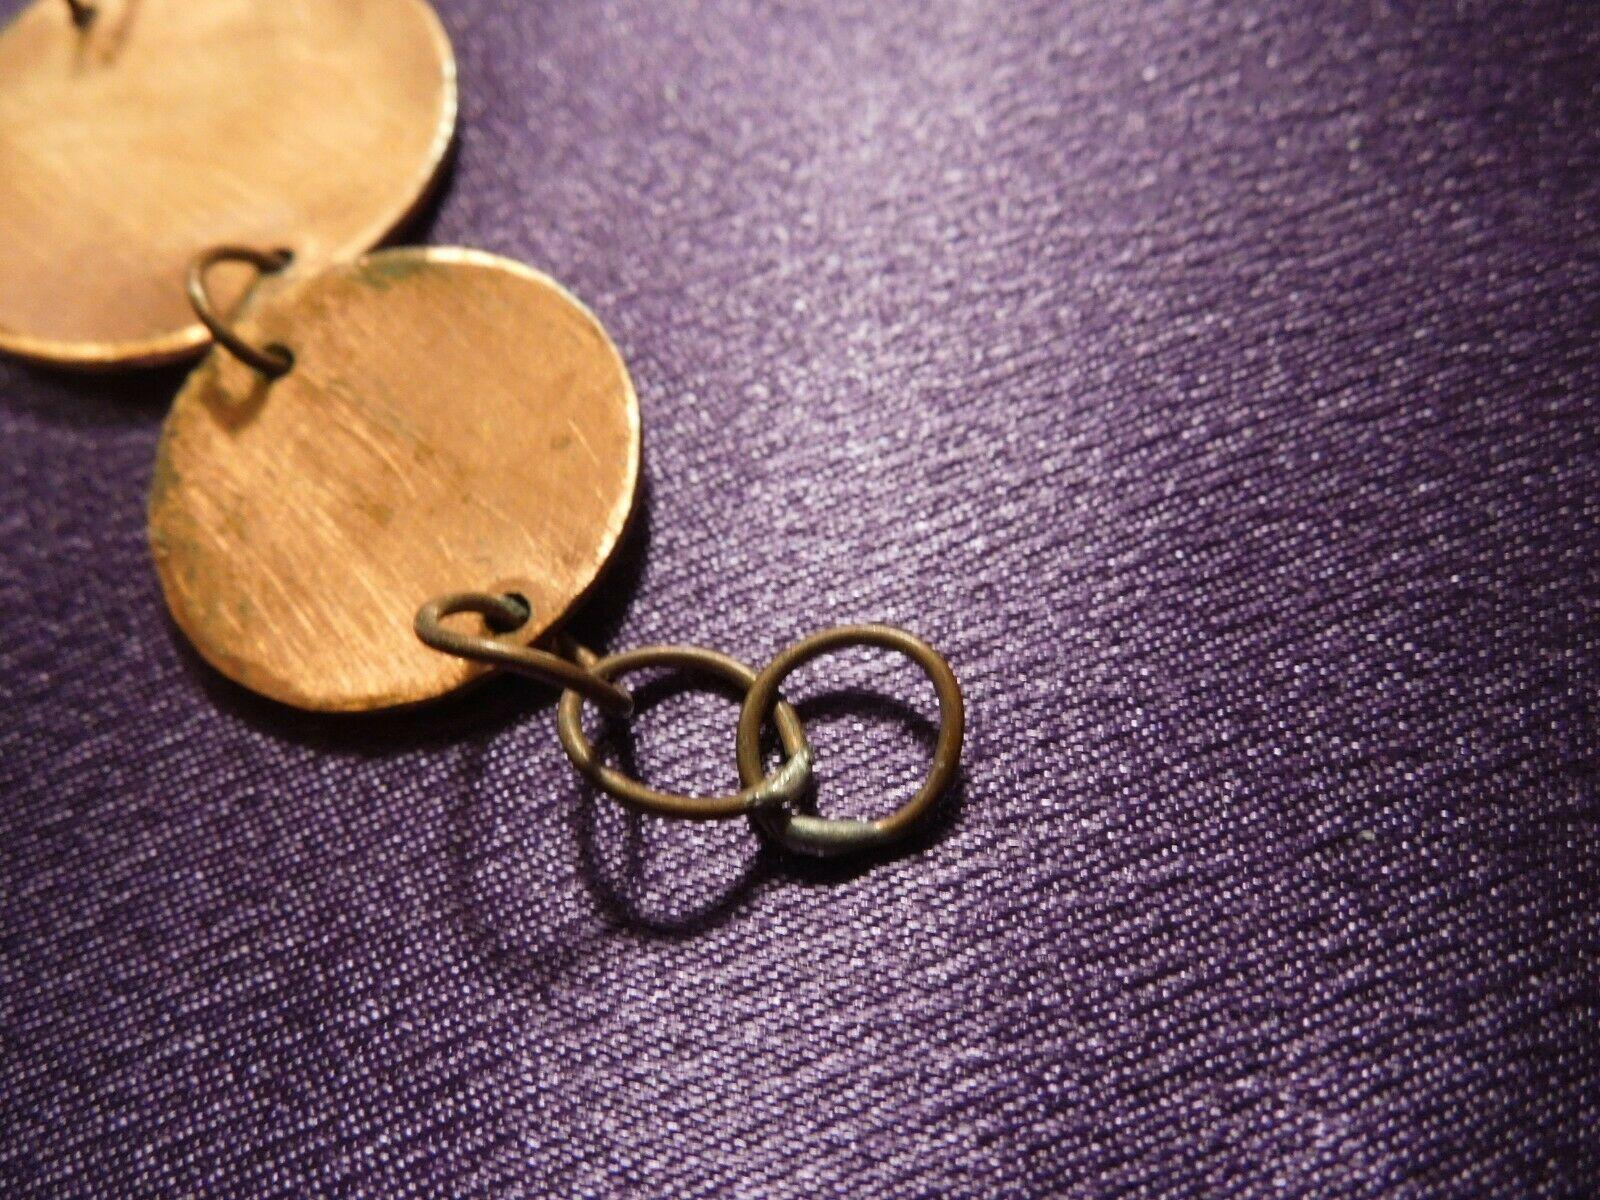 Vintage Enamel Modernist Art Copper Link Bracelet & Screw Back Earrings Set